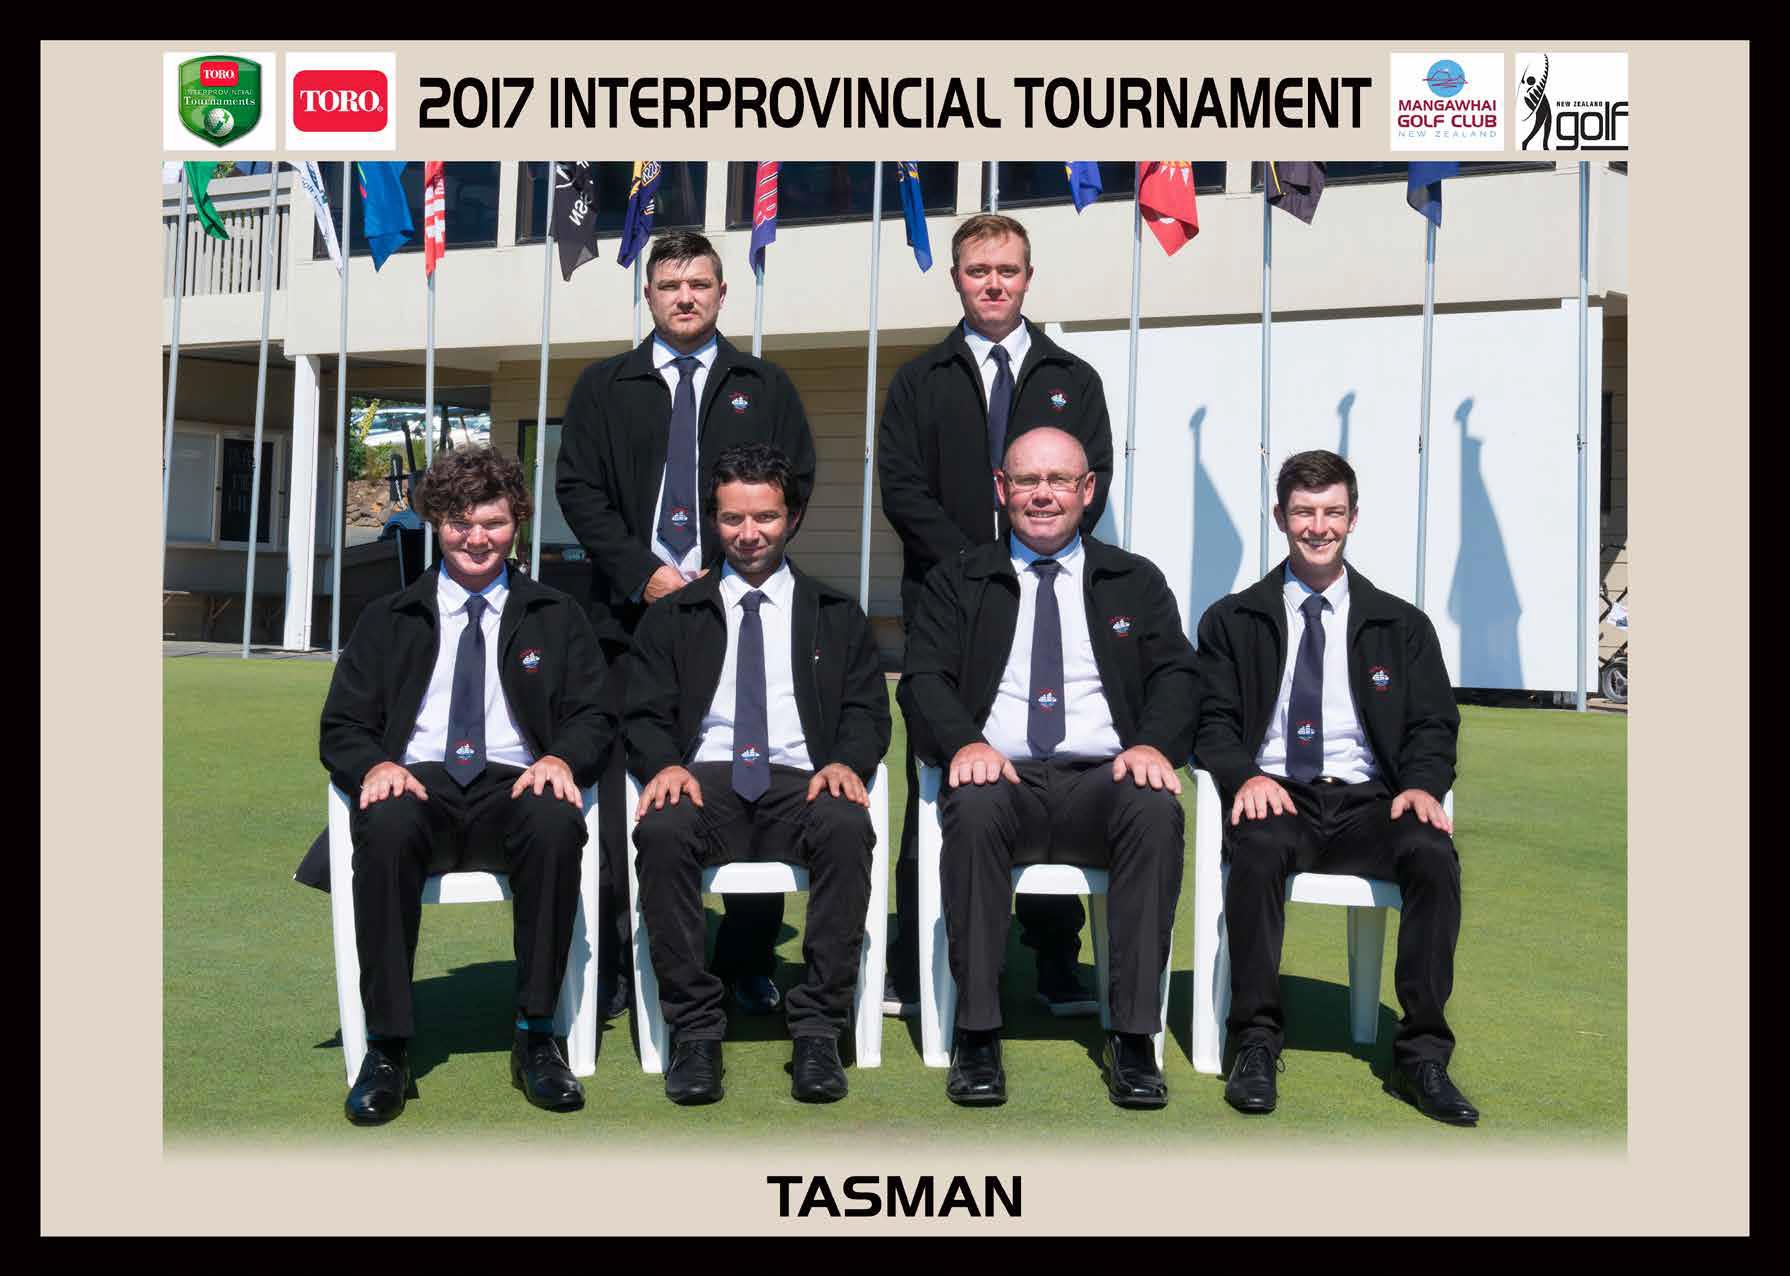 Tasman 2017 NZ Toro Representative Team